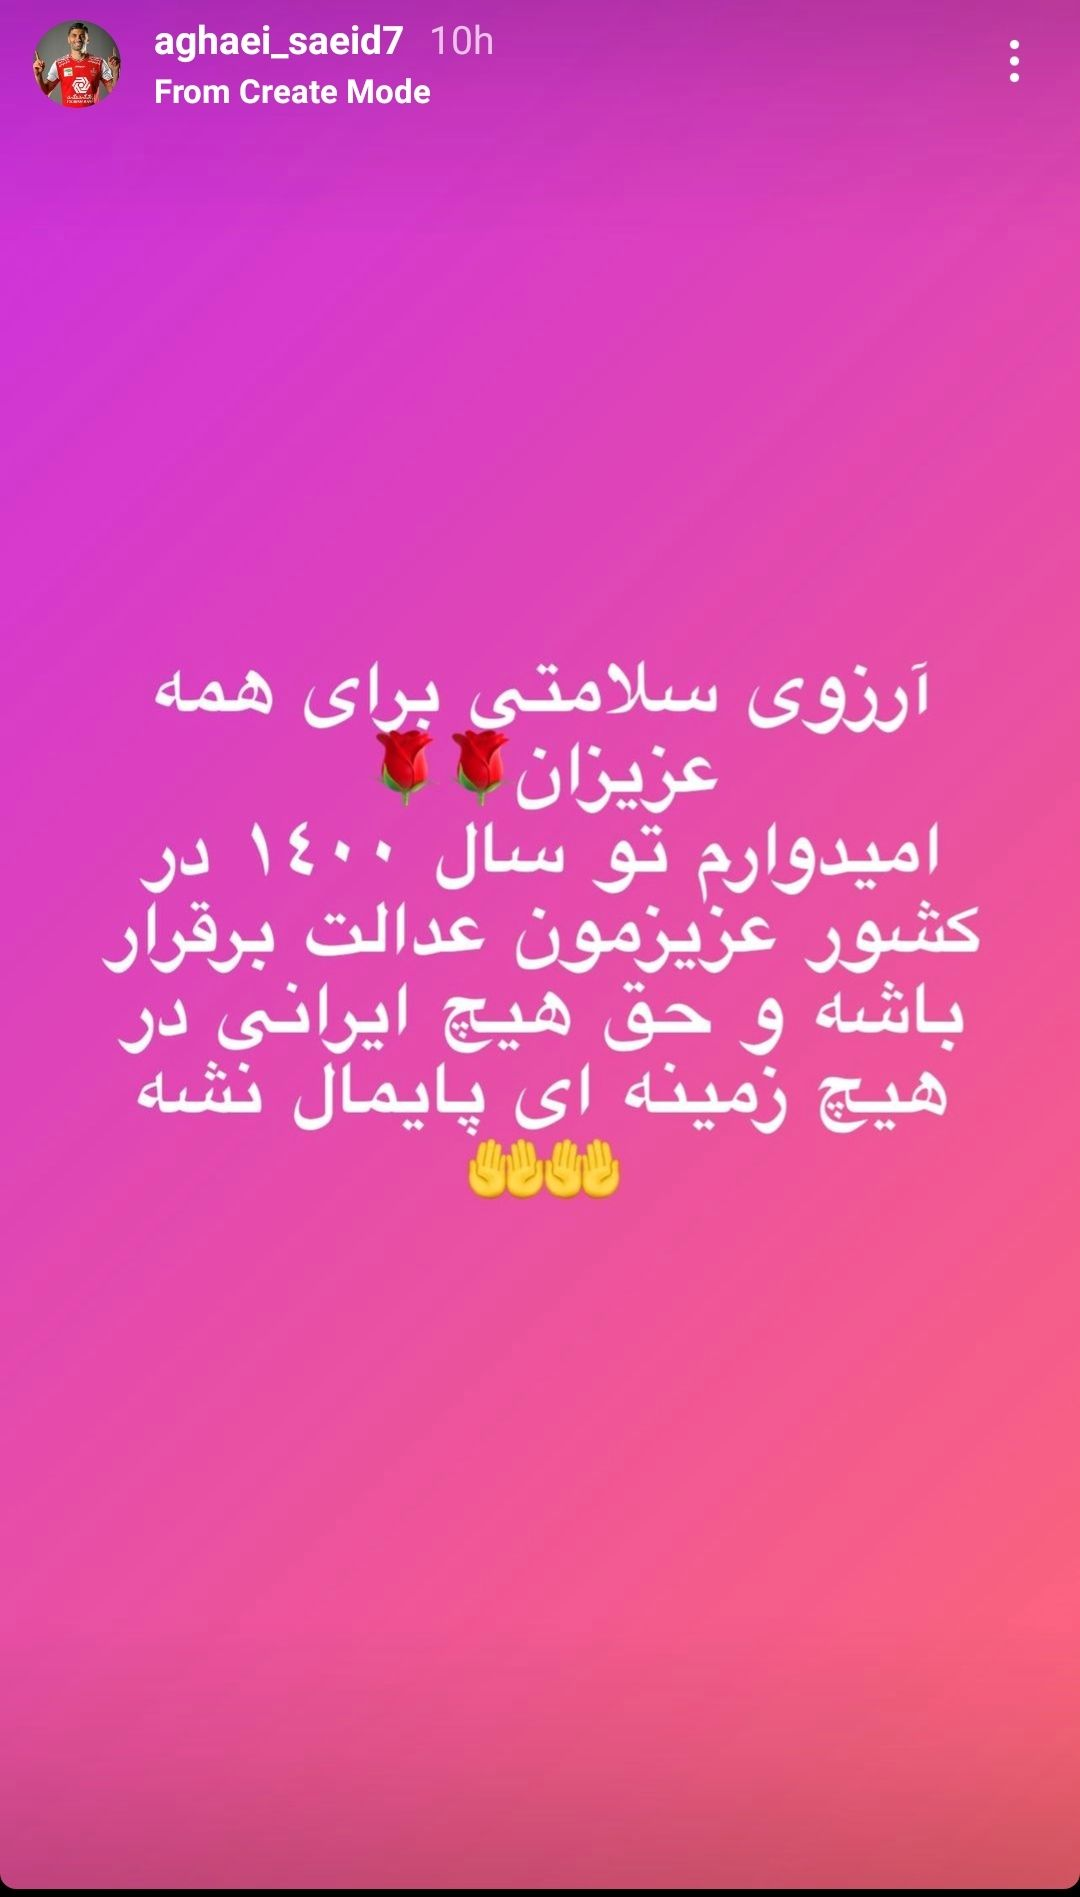 IMG_20210322_095419